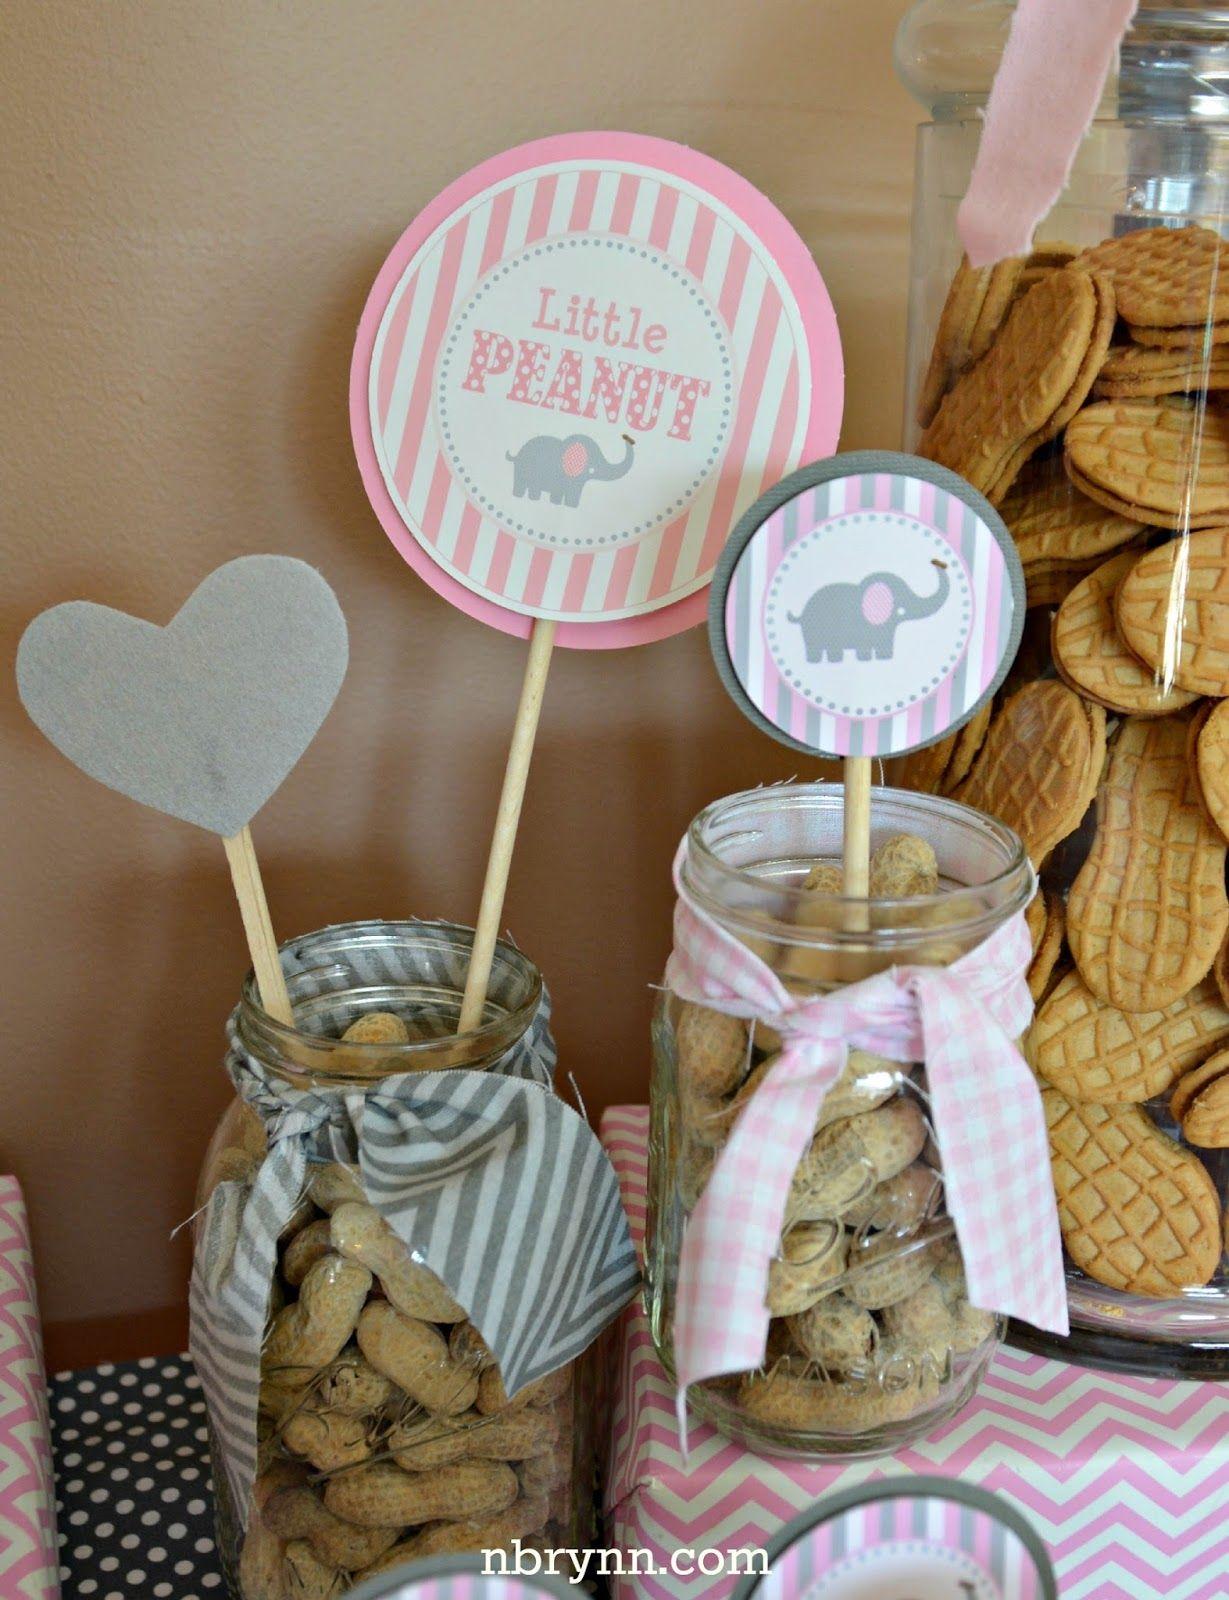 Nbrynn Little Peanut Baby Shower Baby And Baby Shower Pinterest